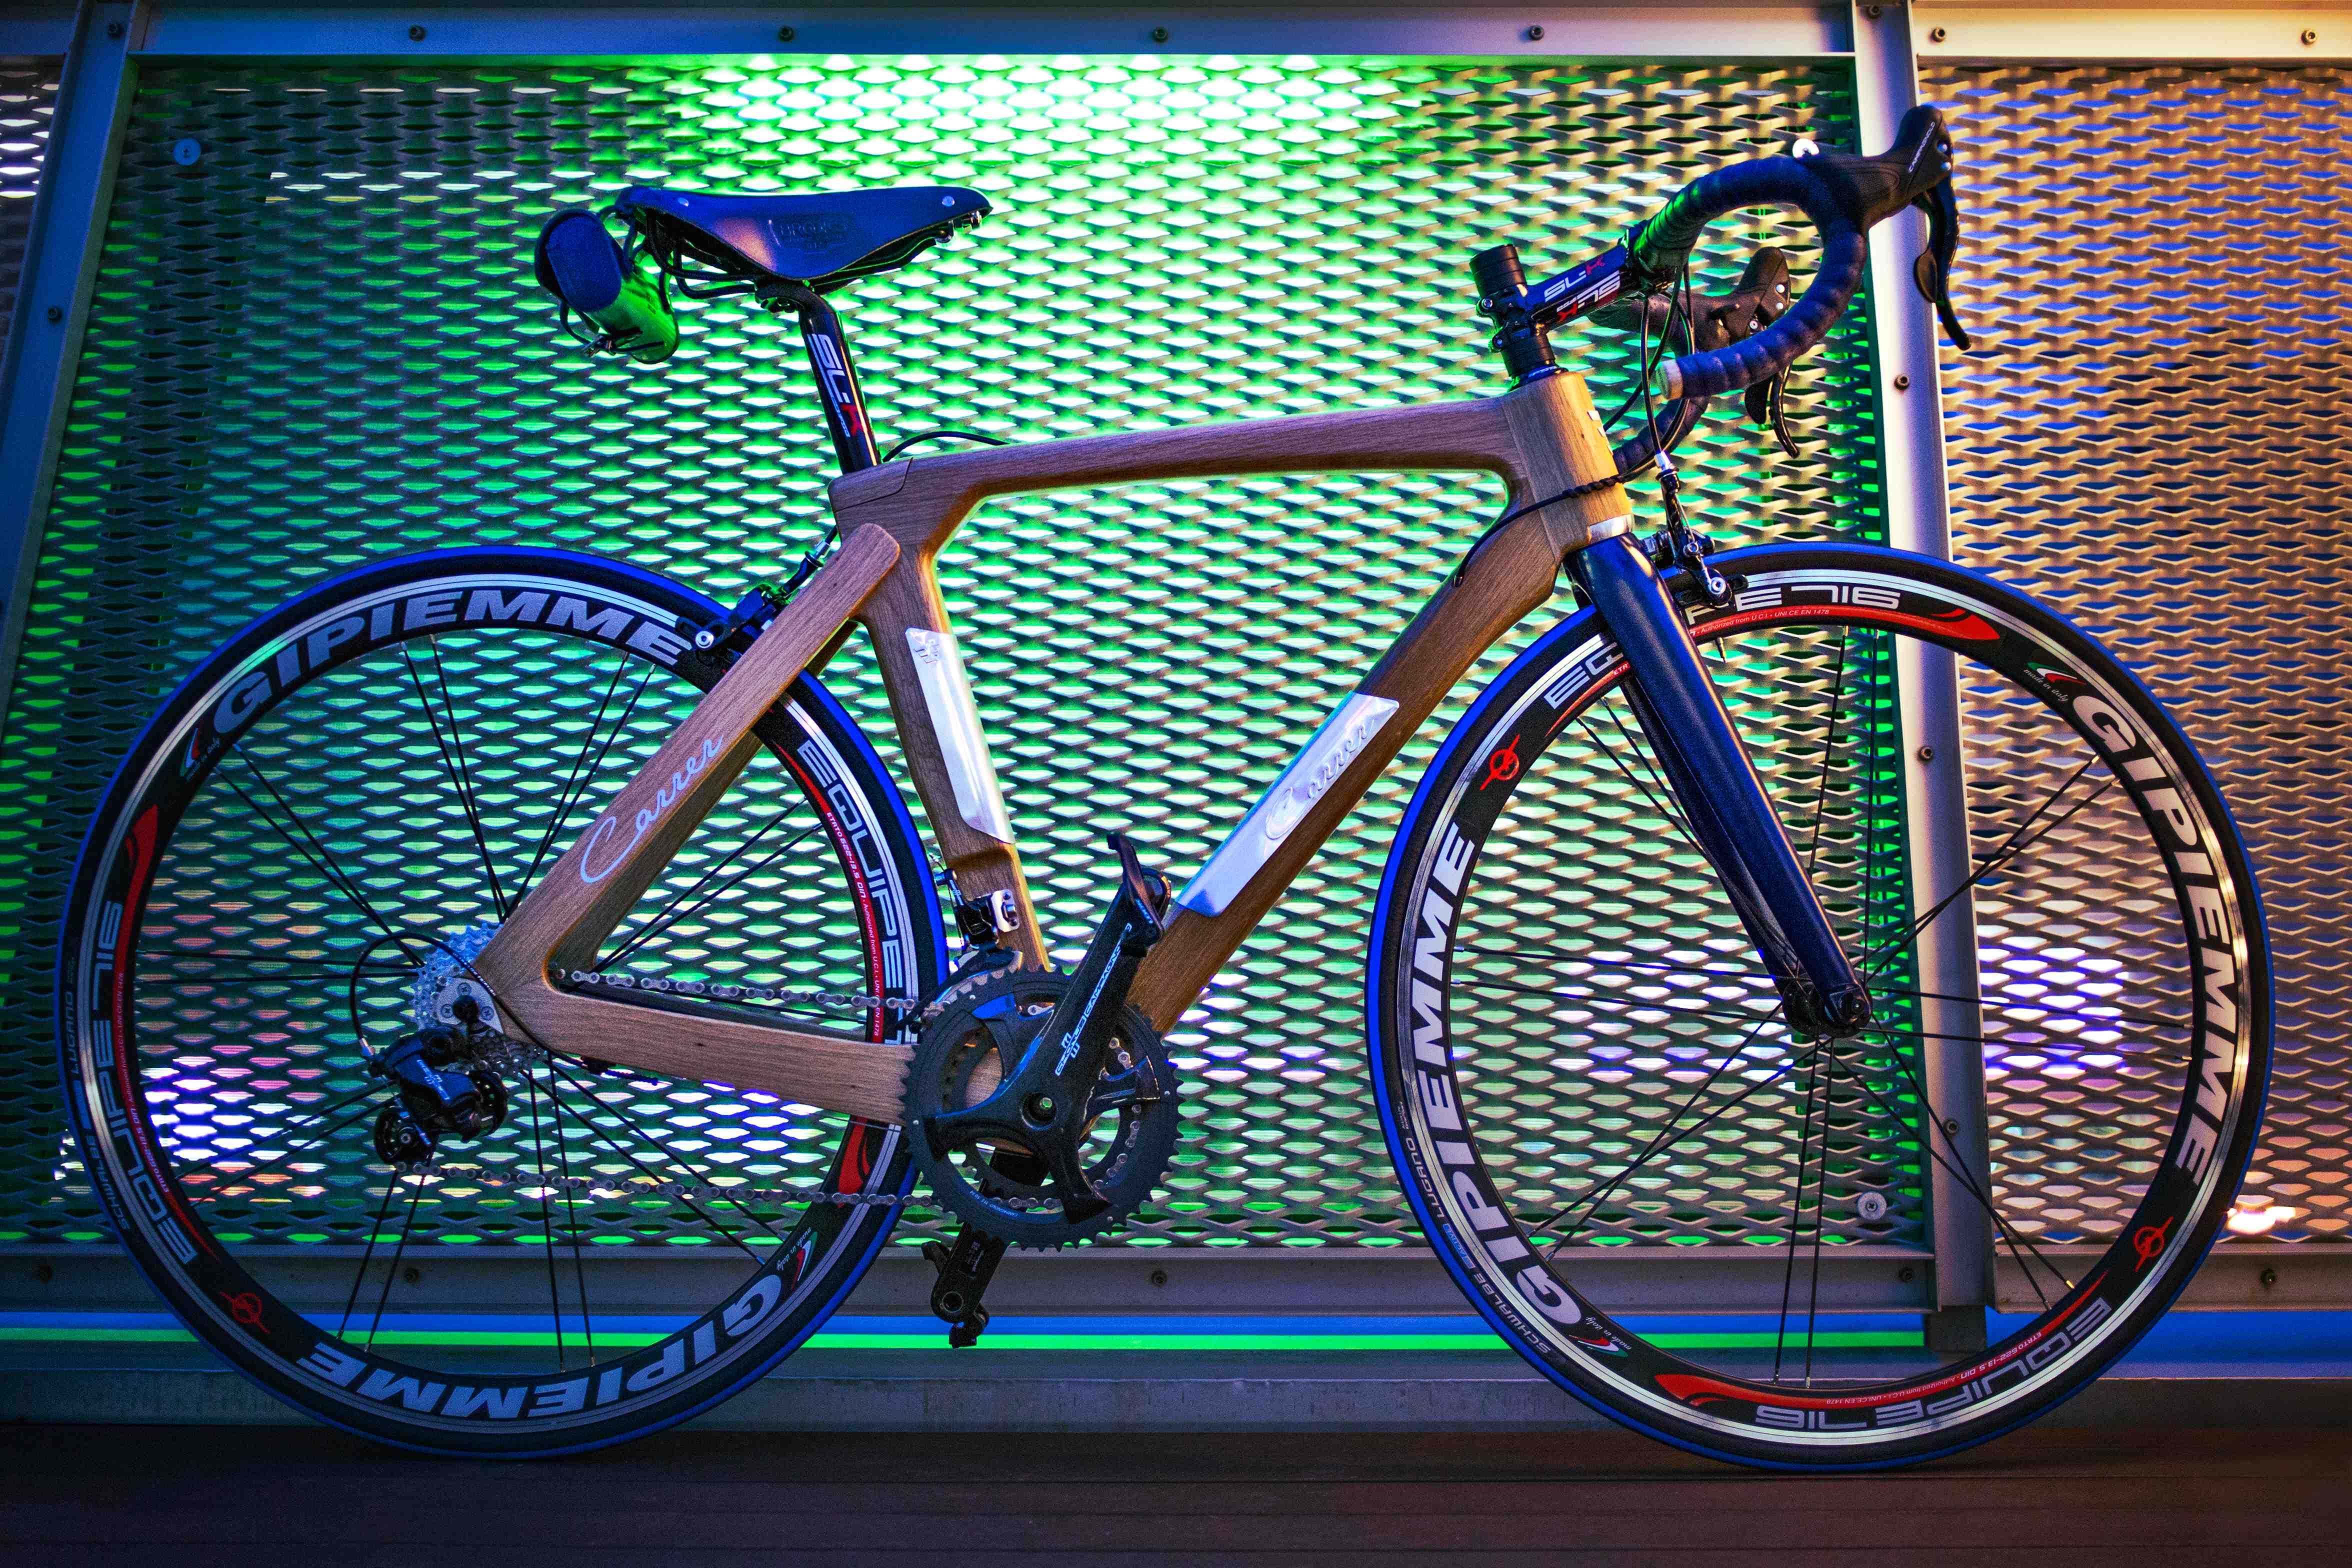 Nasce Carrer Bike Bici Da Strada Su Misura Con Telaio In